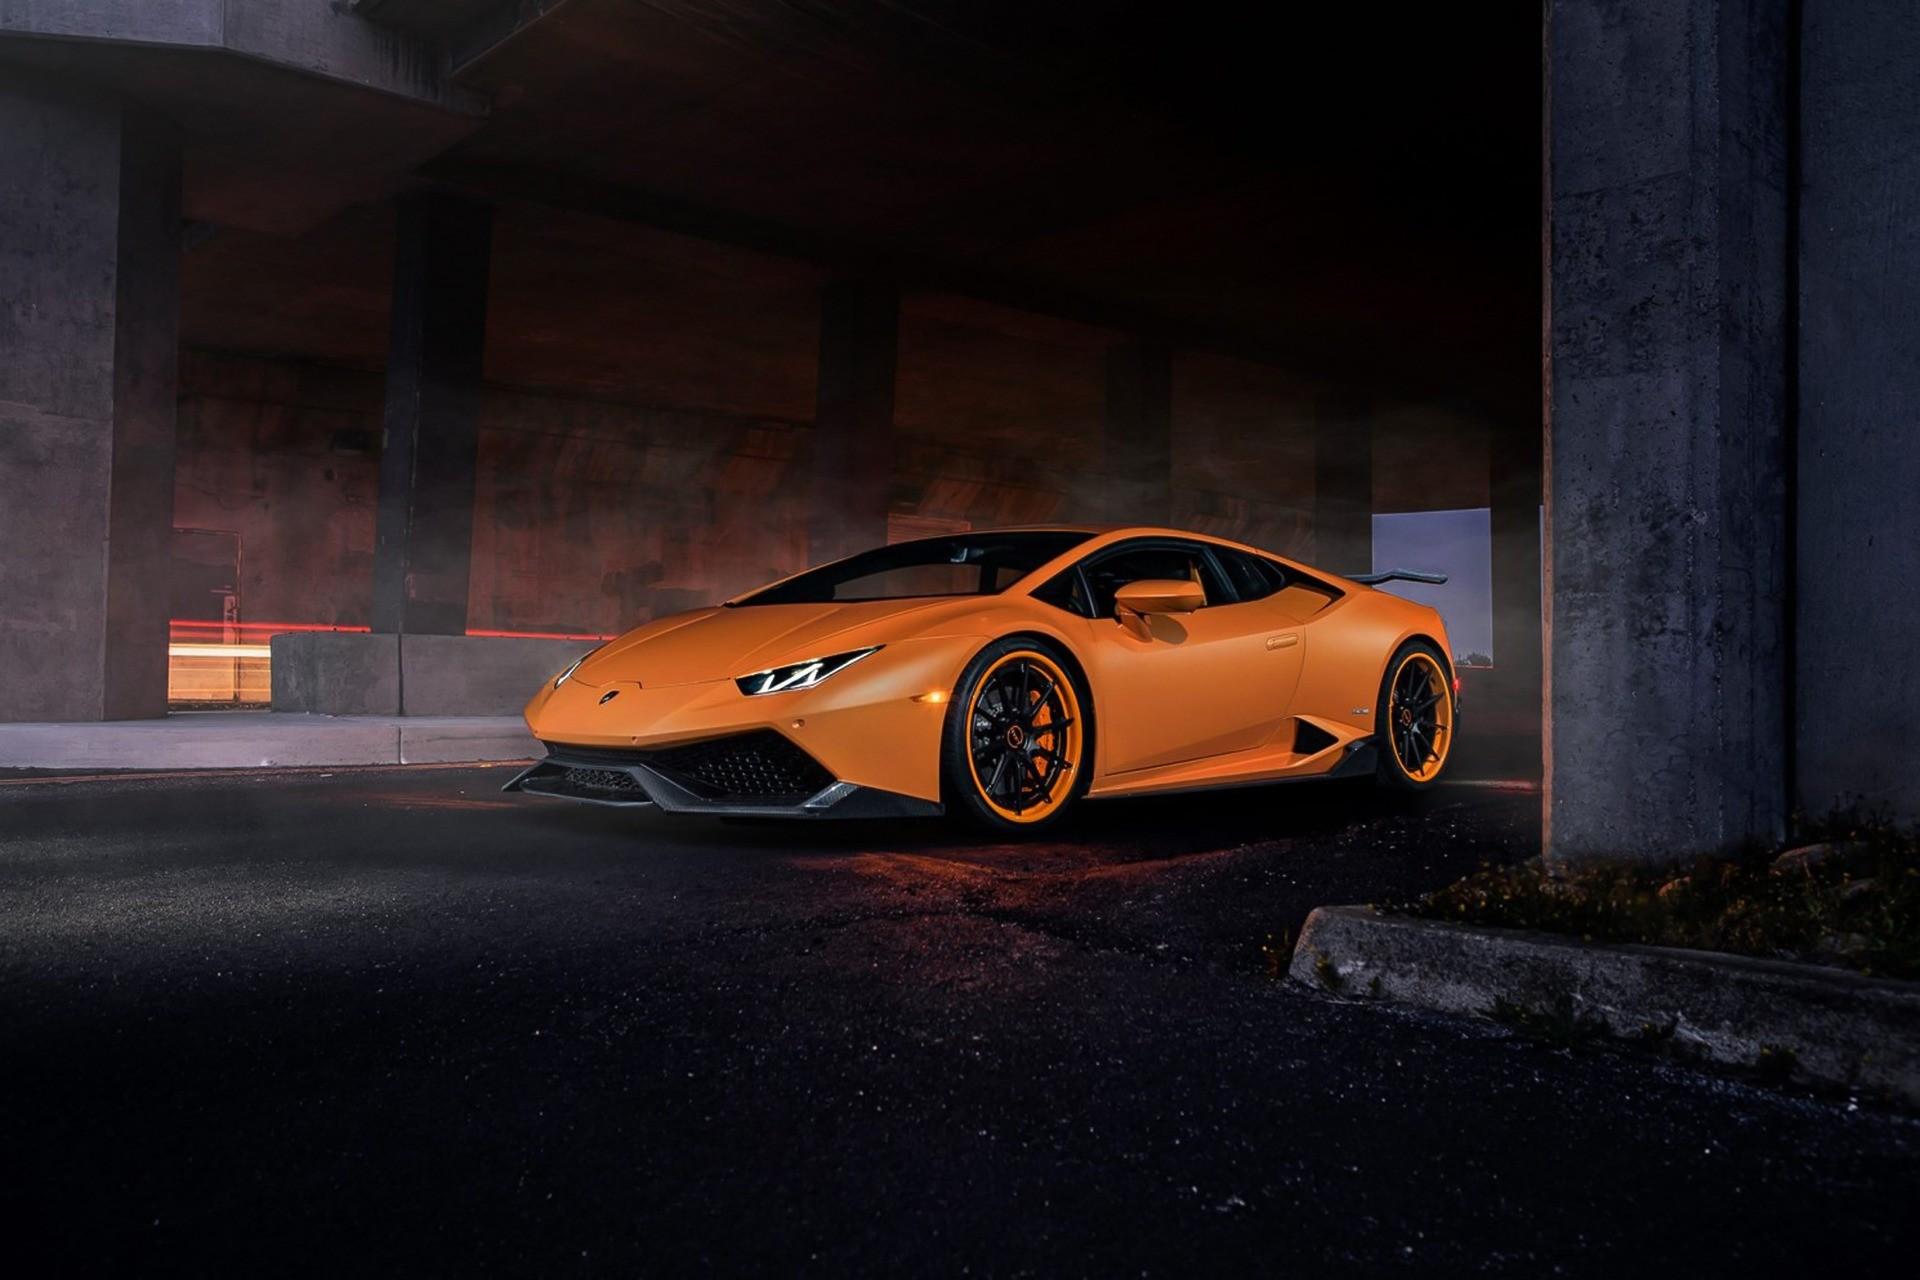 Car Vehicle Lamborghini Aventador Sports Huracan Performance Supercar Land Automotive Design